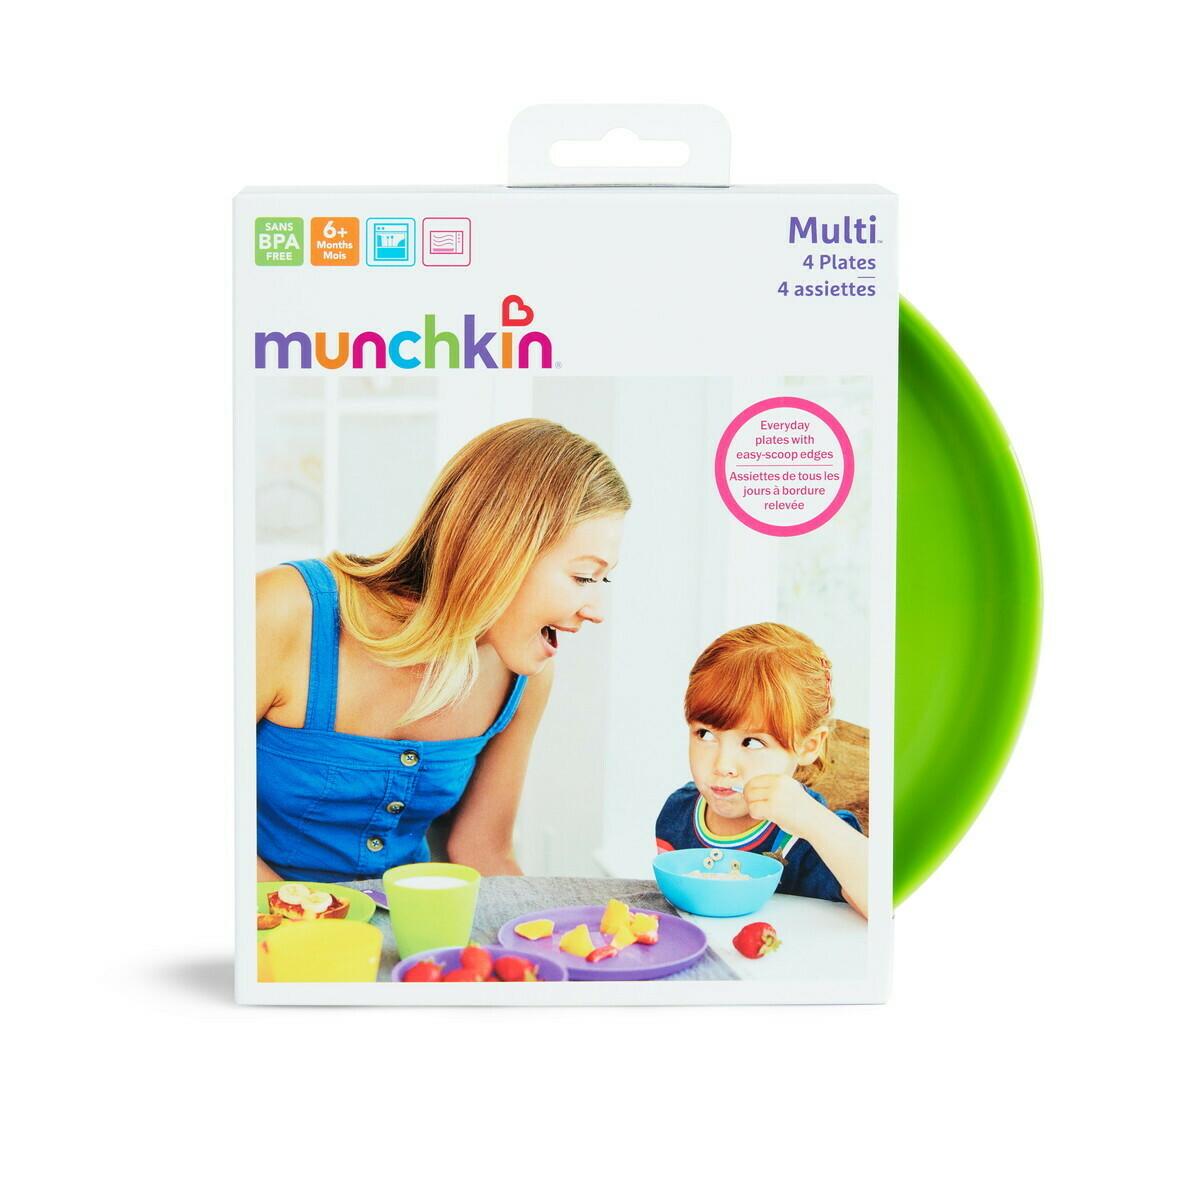 Munchkin-4PK MODERN MULTI PLATES